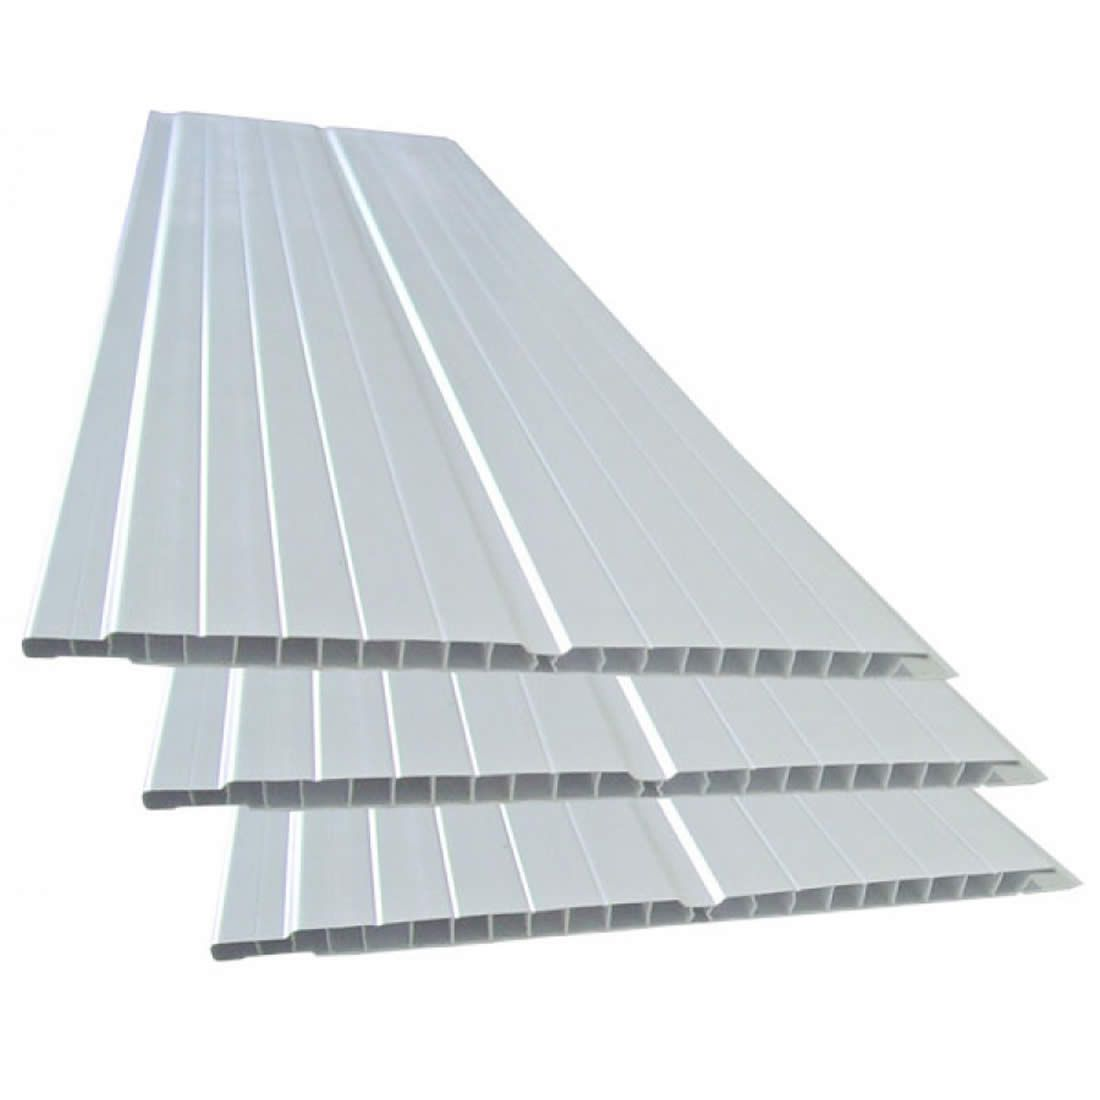 Forro PVC 200X8mm de 6,00 Metros Frisado Branco Mais PVC, 1,20mts = 1 Peças